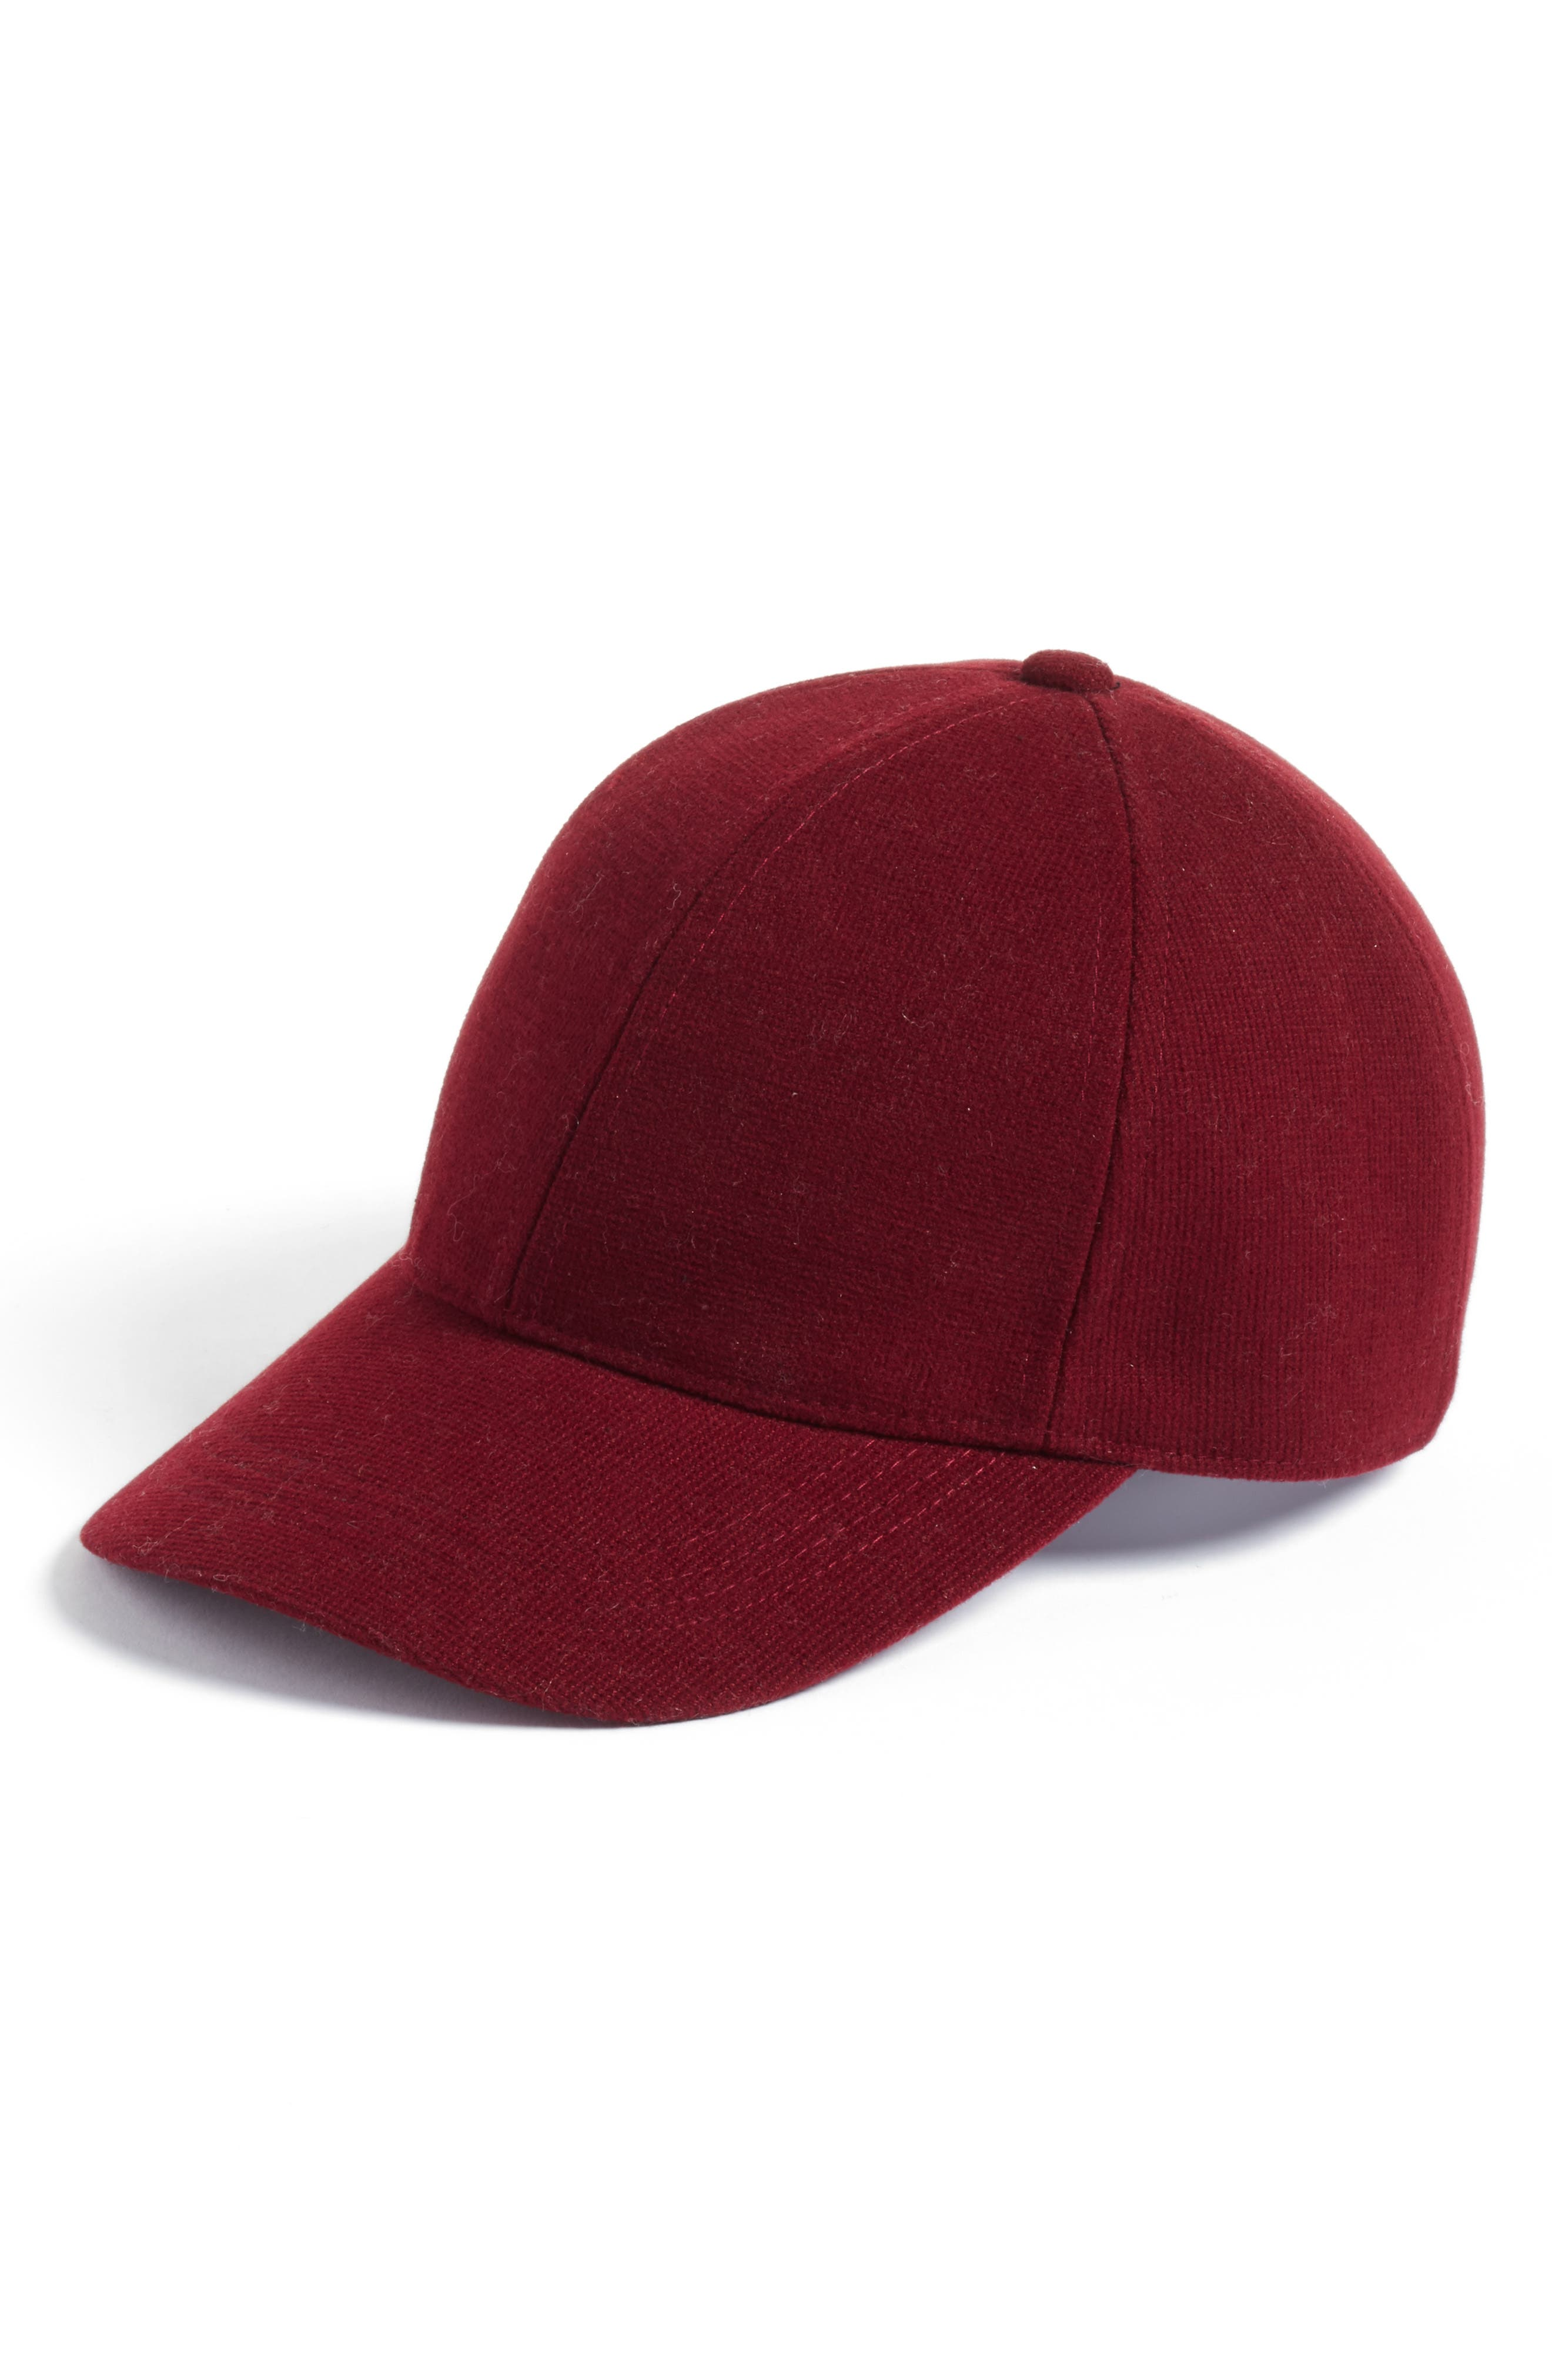 Alternate Image 1 Selected - Treasure & Bond Adjustable Baseball Cap